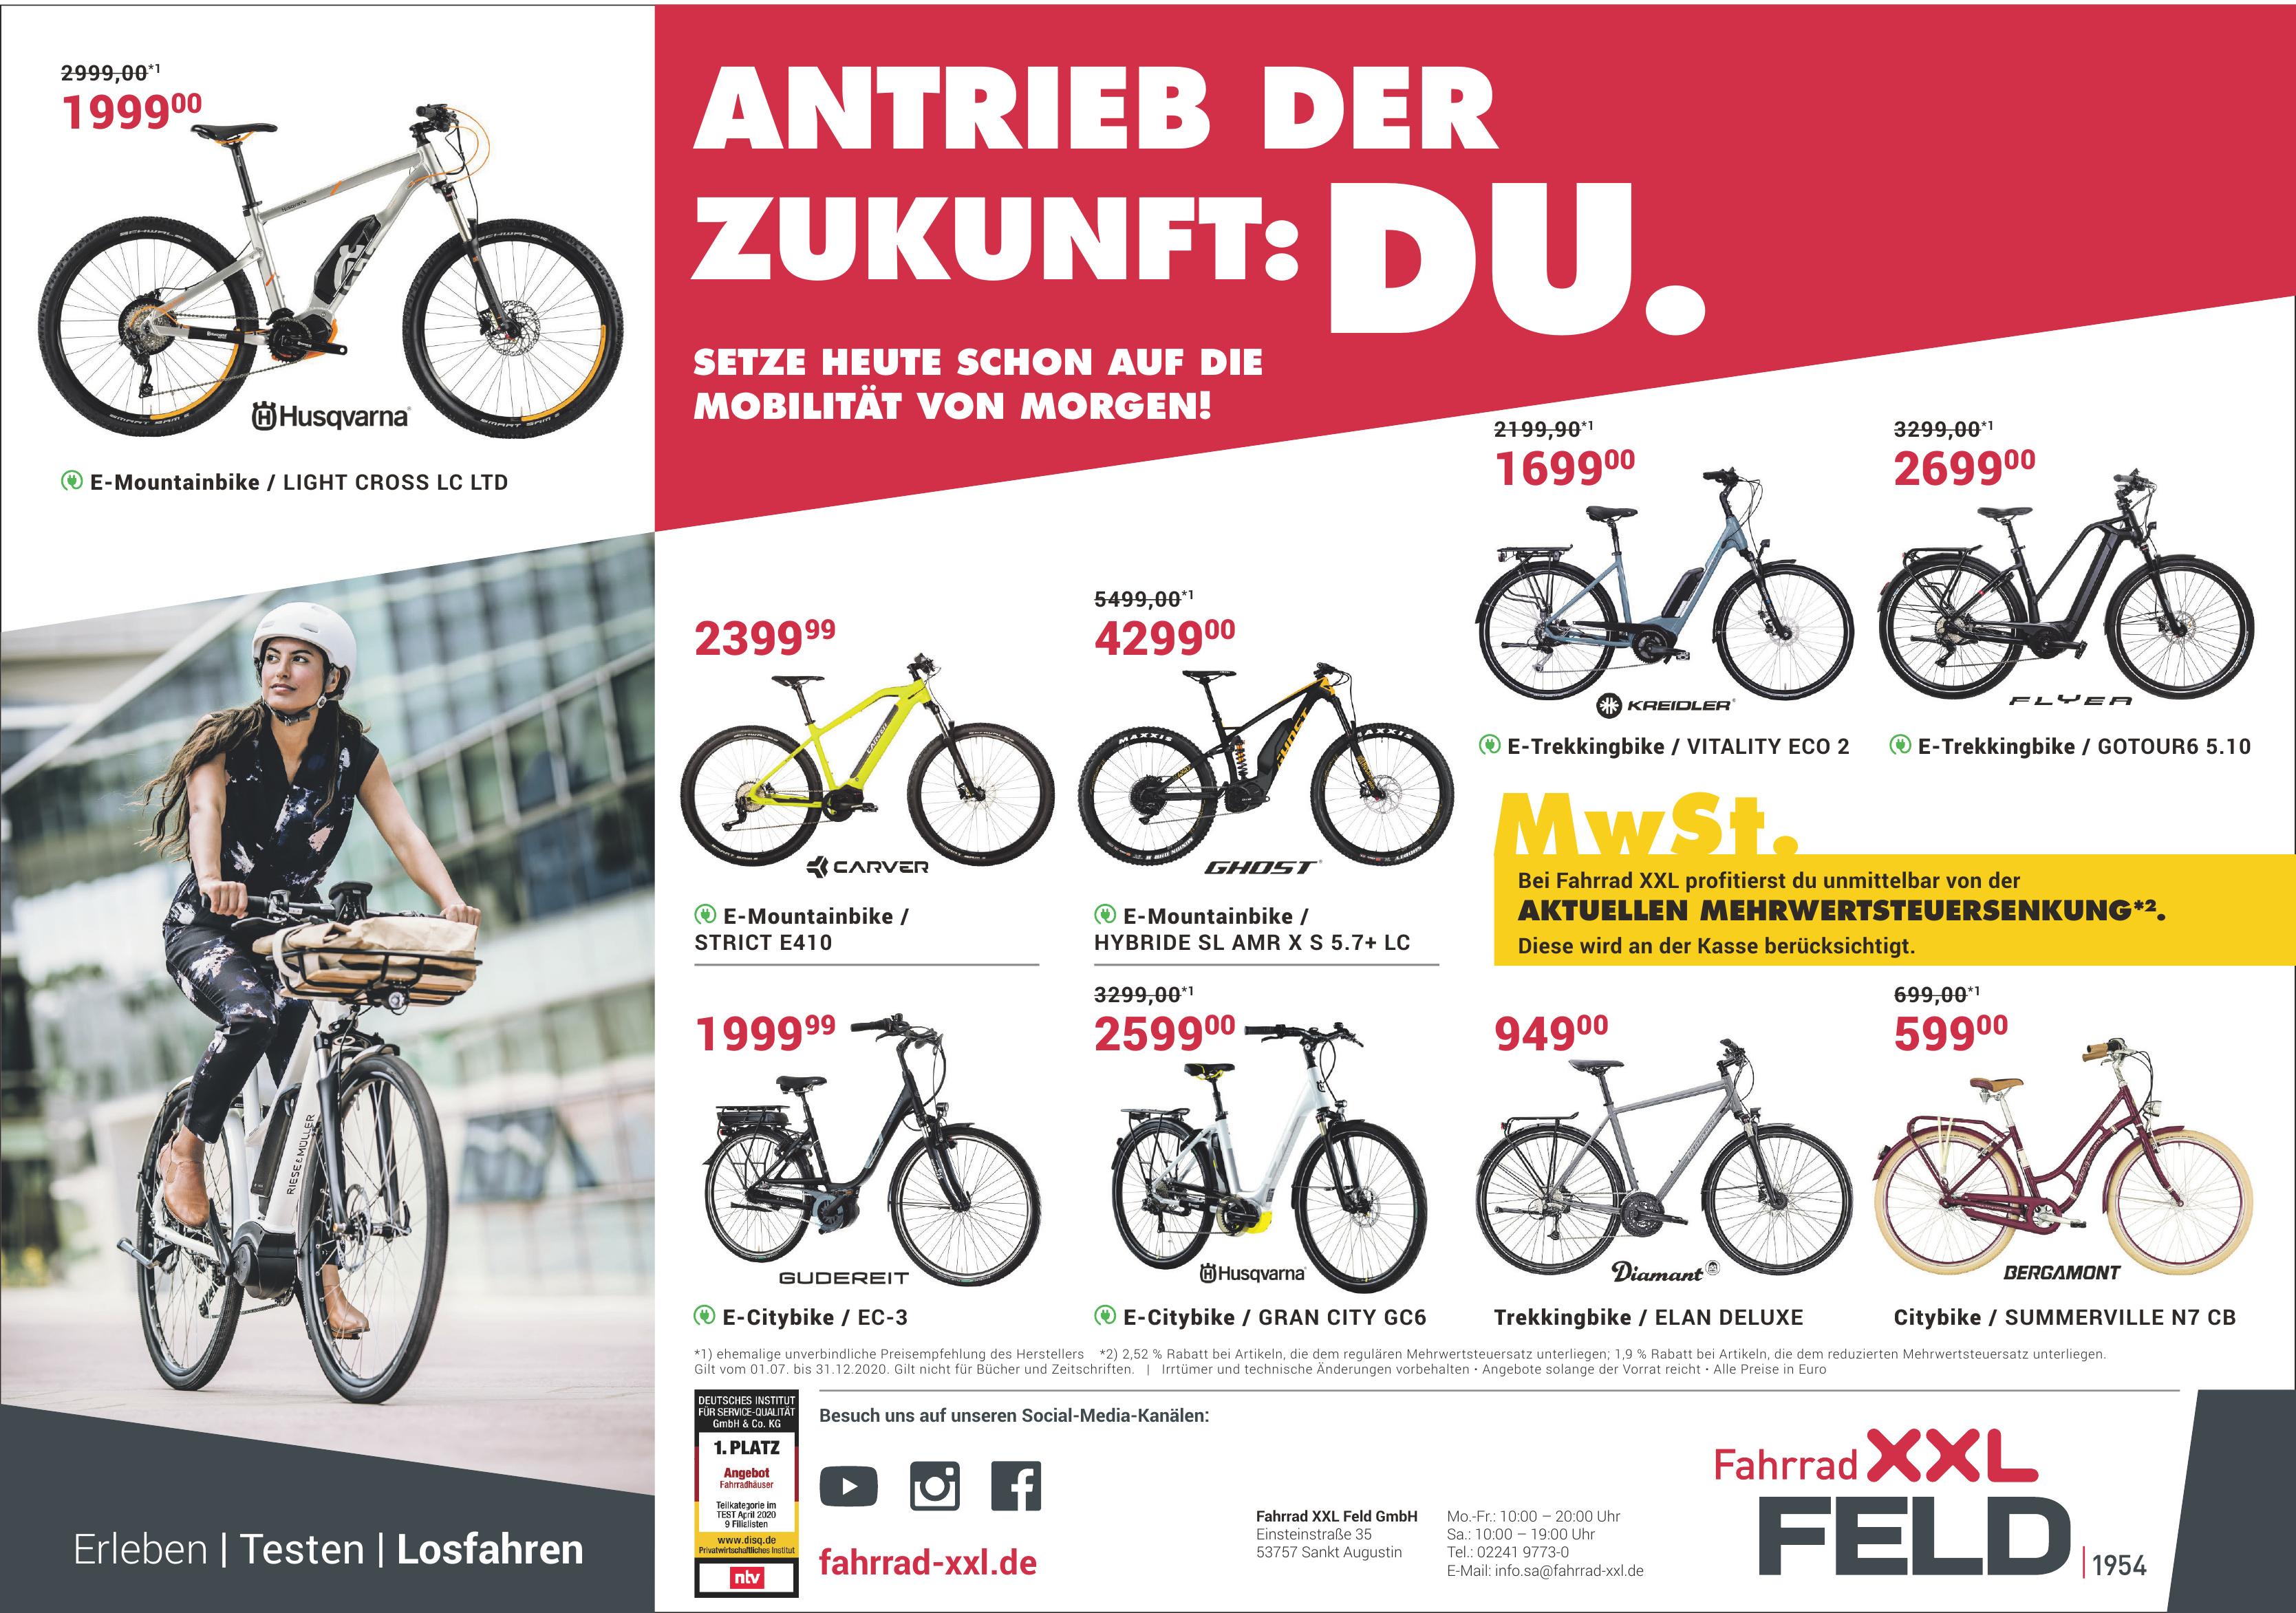 Fahrrad XXL Feld GmbH